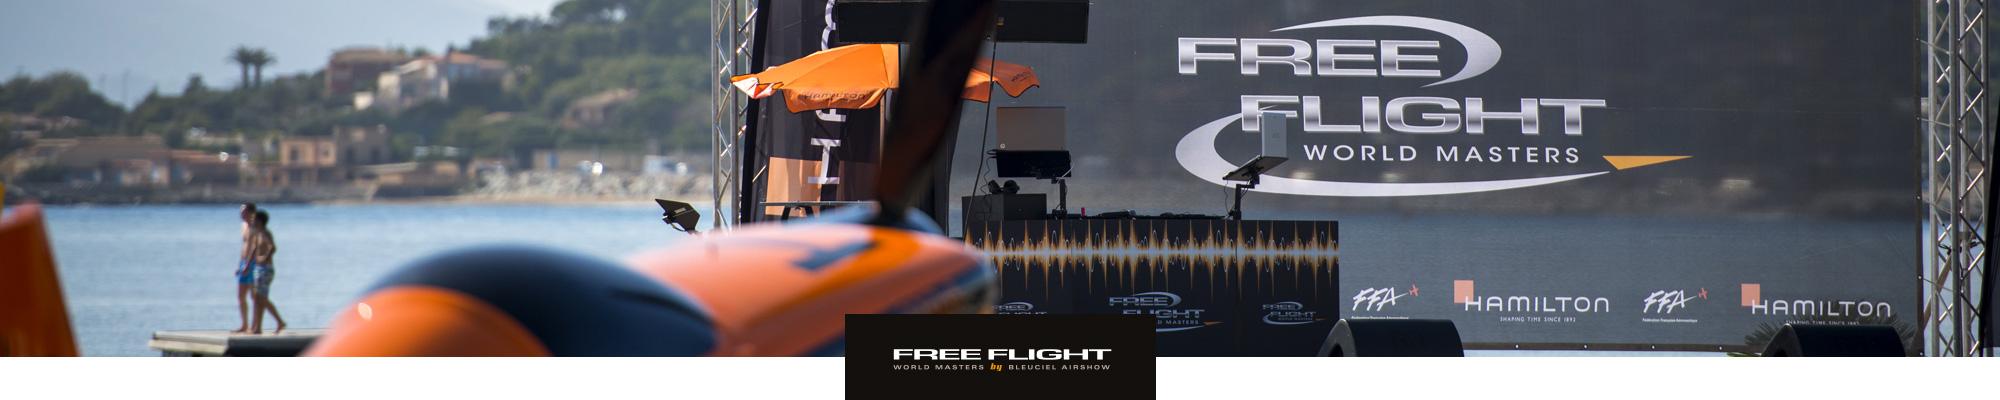 Free flight meeting aérien